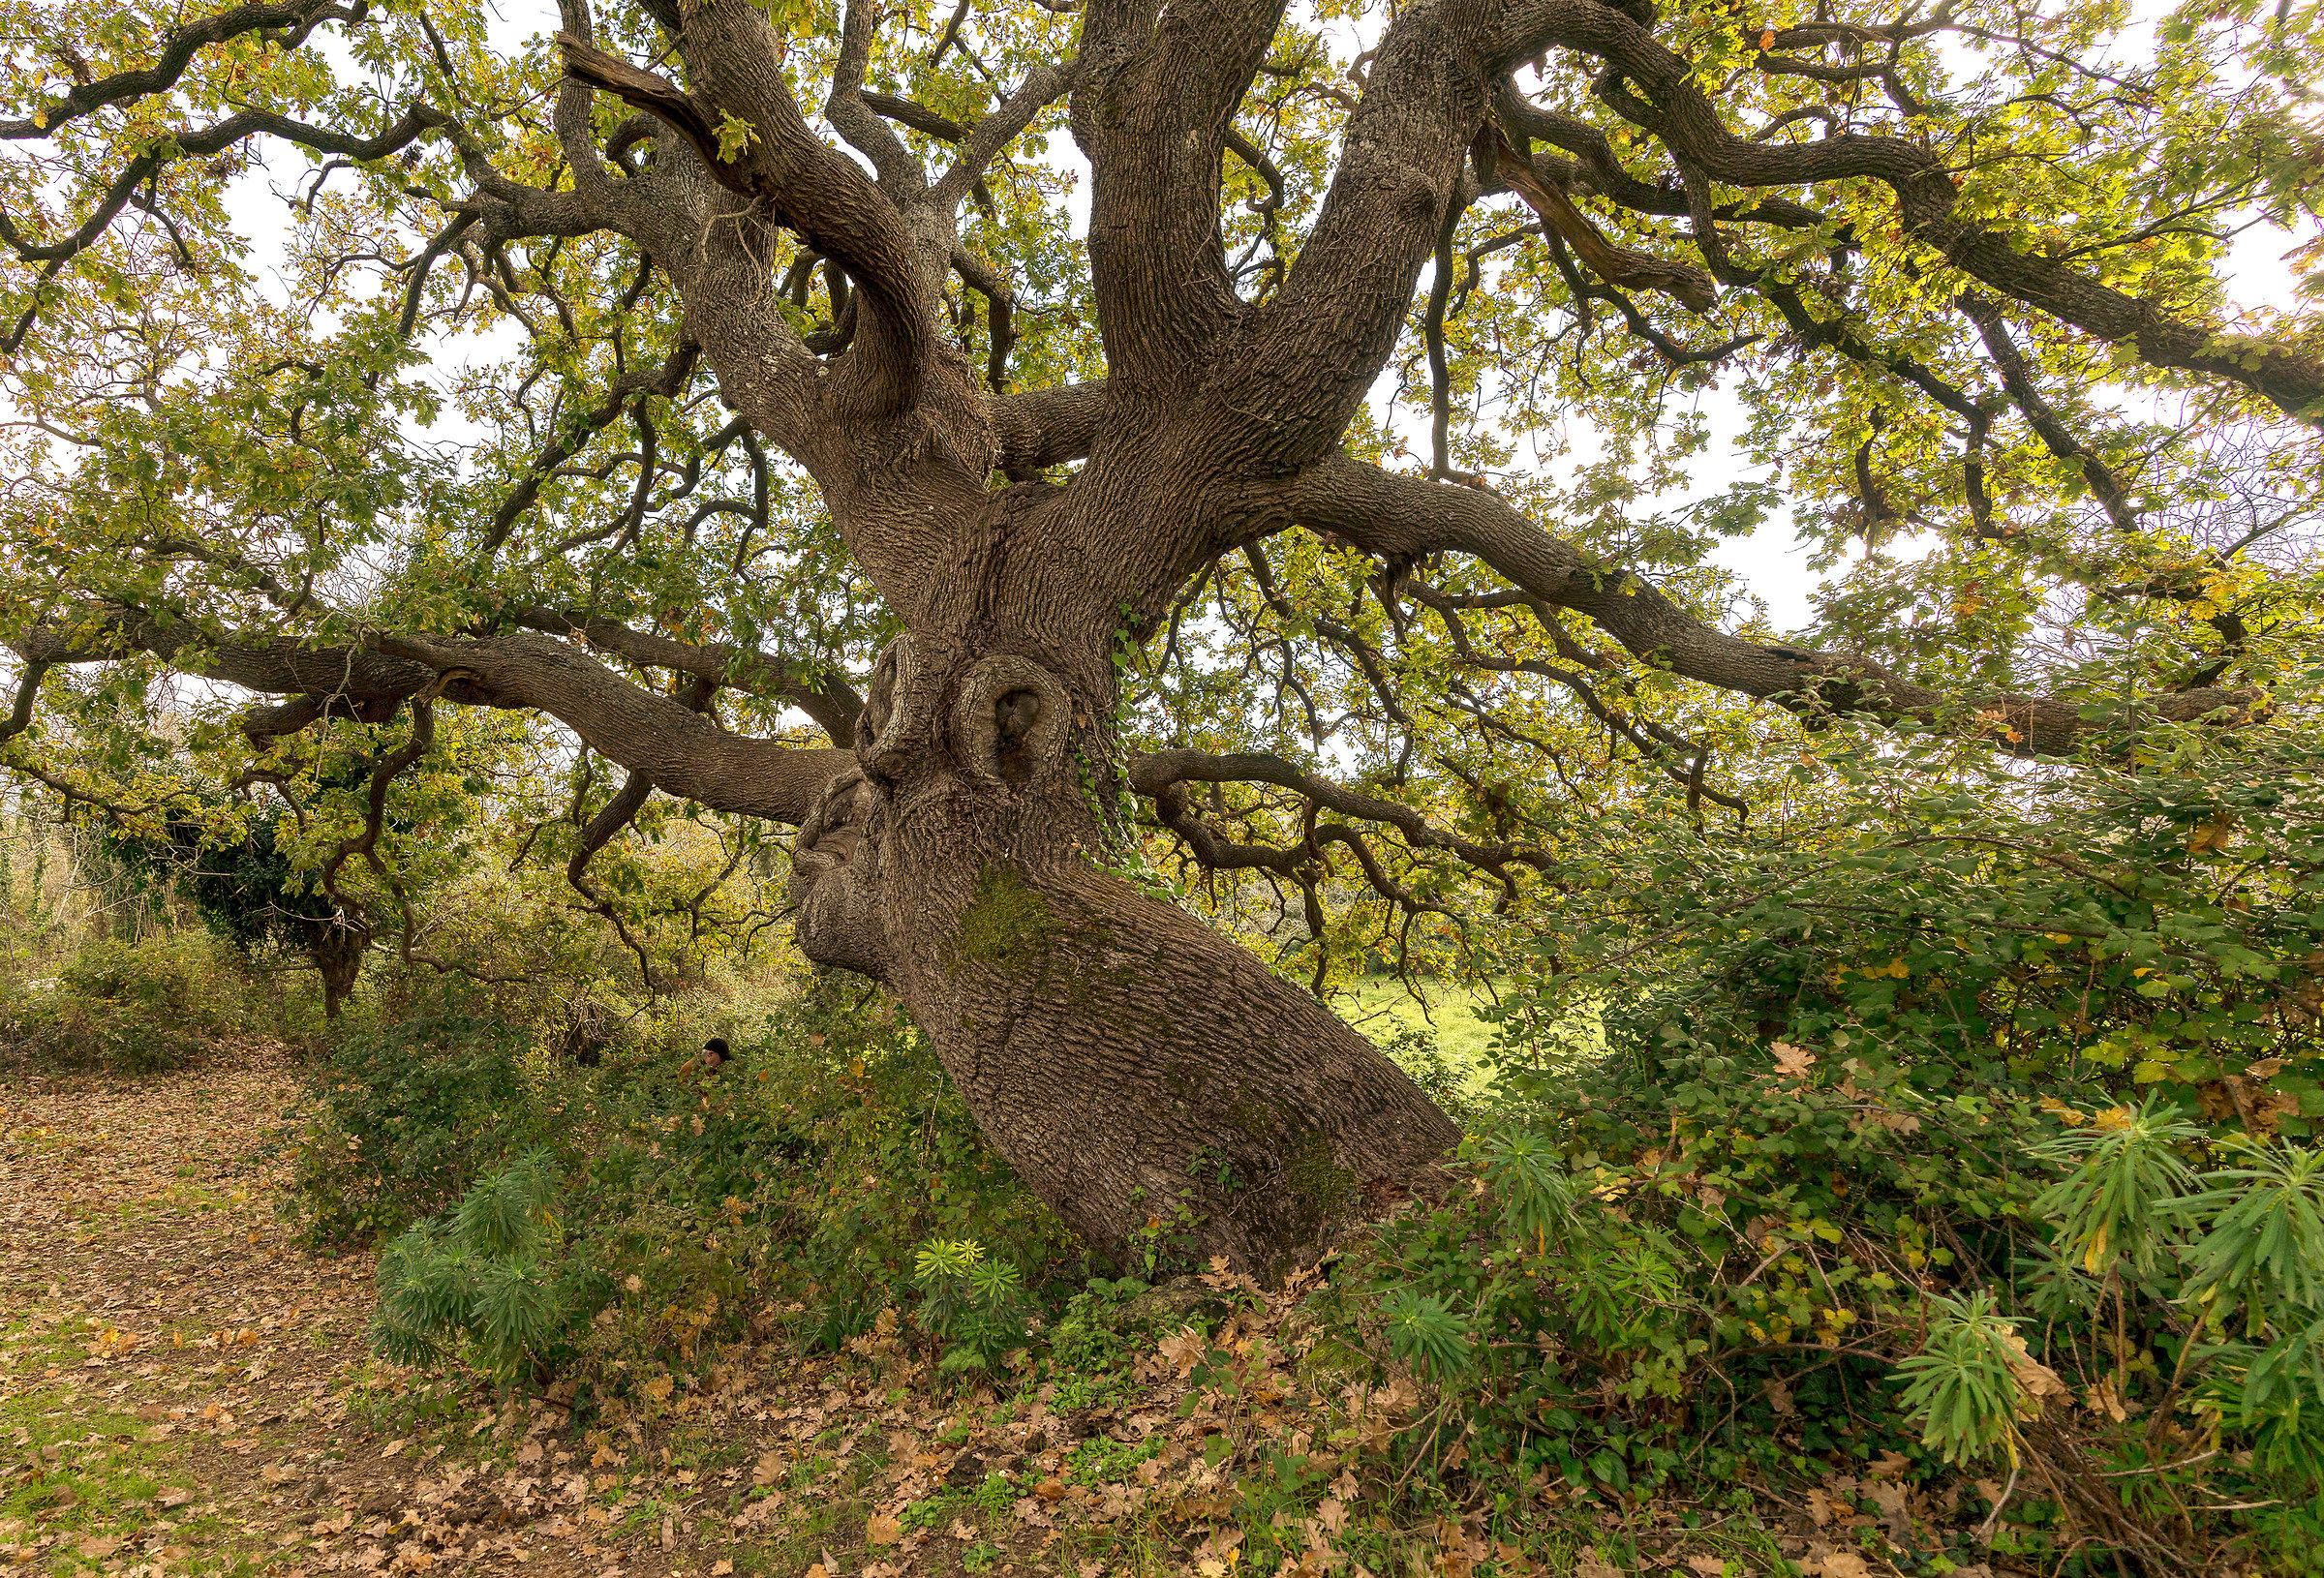 quercia più antica degli Iblei...